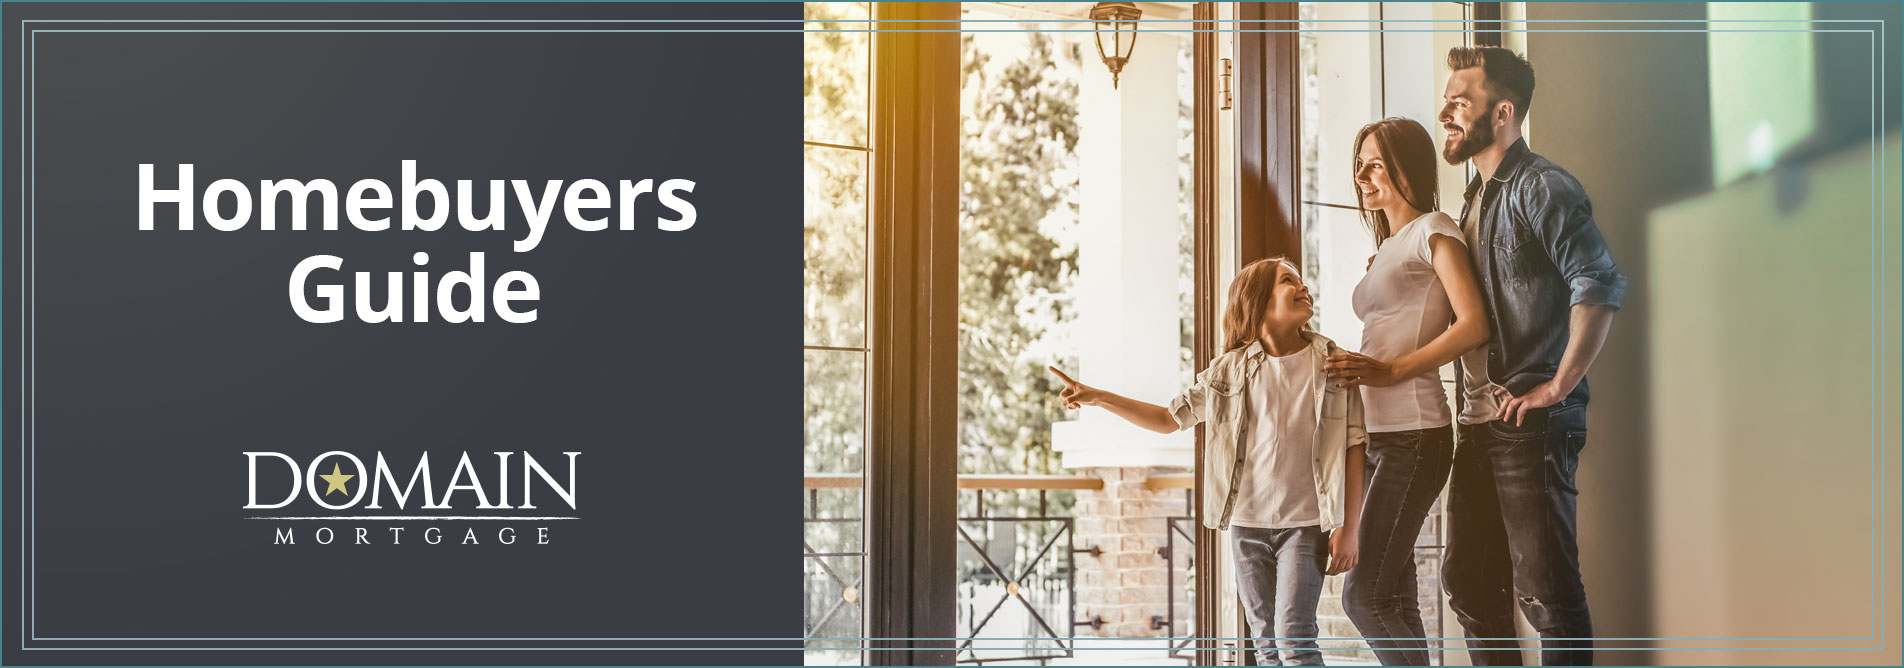 Homebuyers Guide